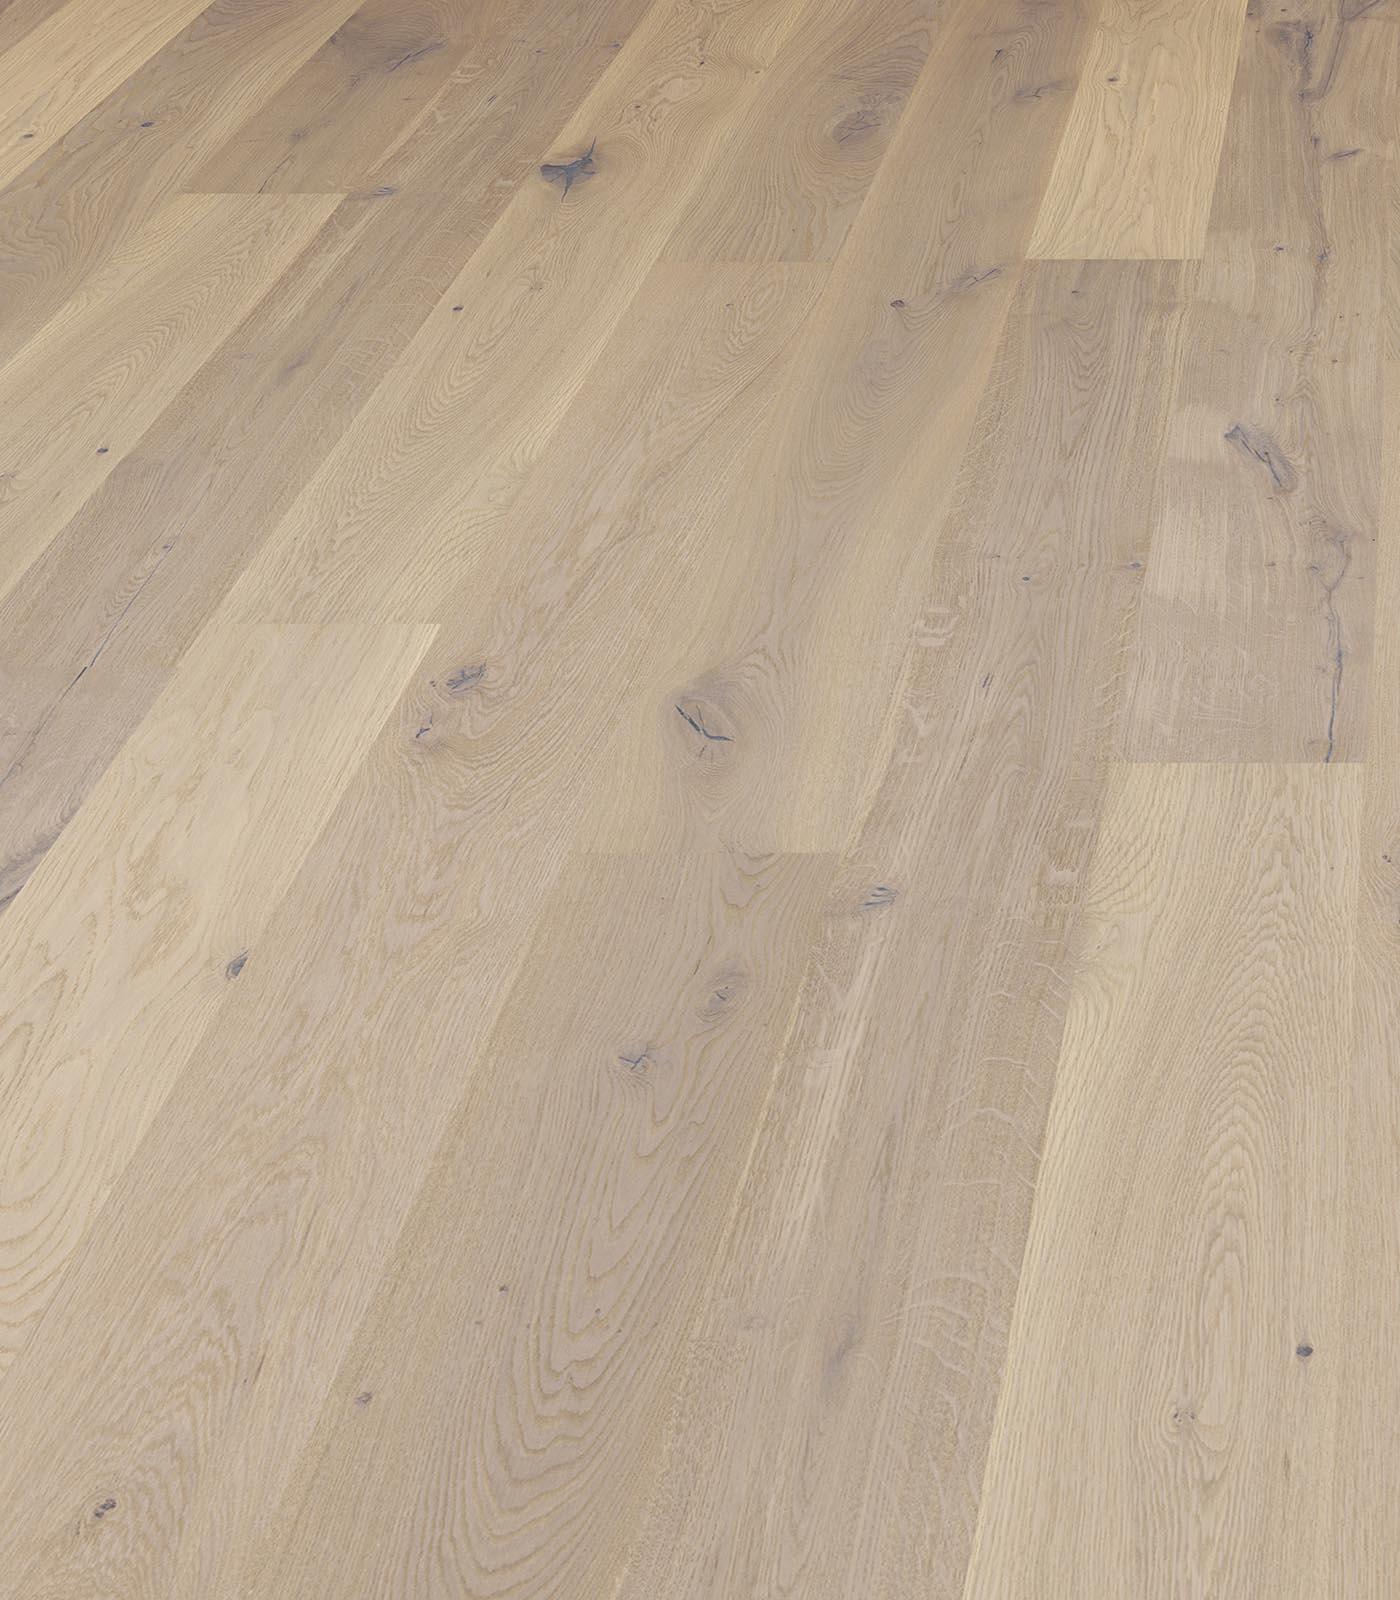 Andes-Flooring engineered european Oak